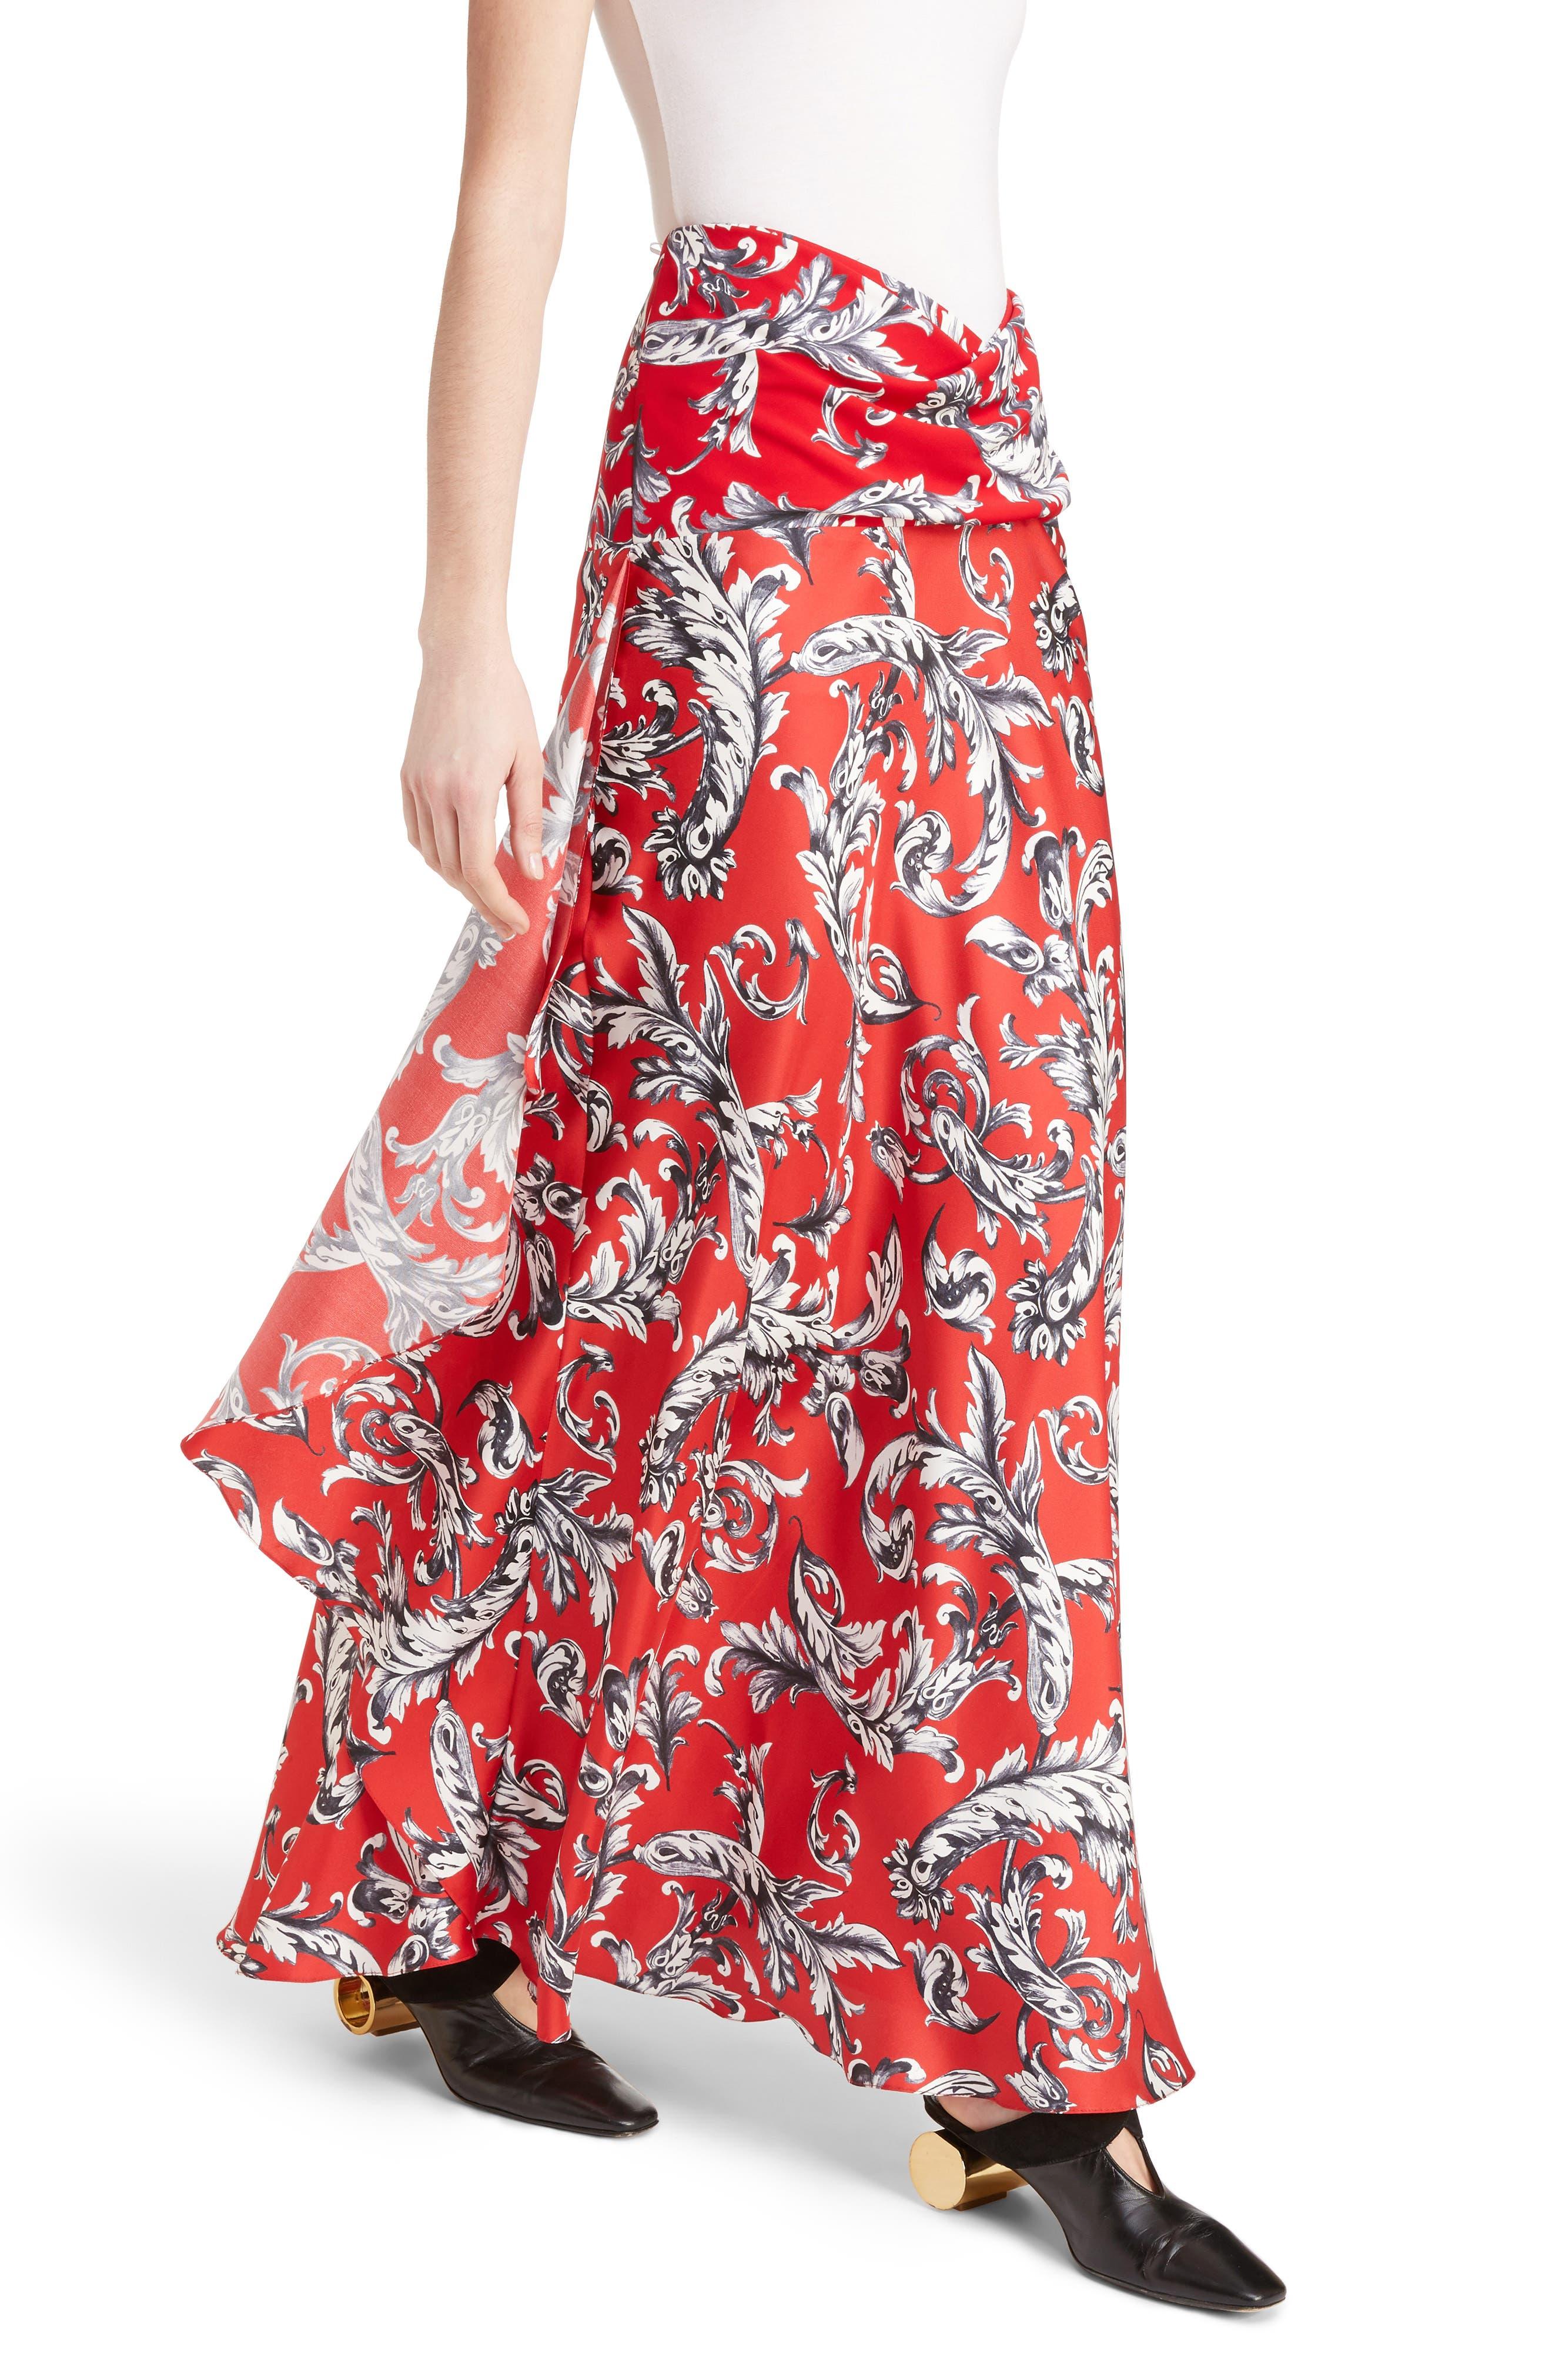 J.W.ANDERSON Filigree Print Asymmetrical Maxi Skirt,                             Alternate thumbnail 4, color,